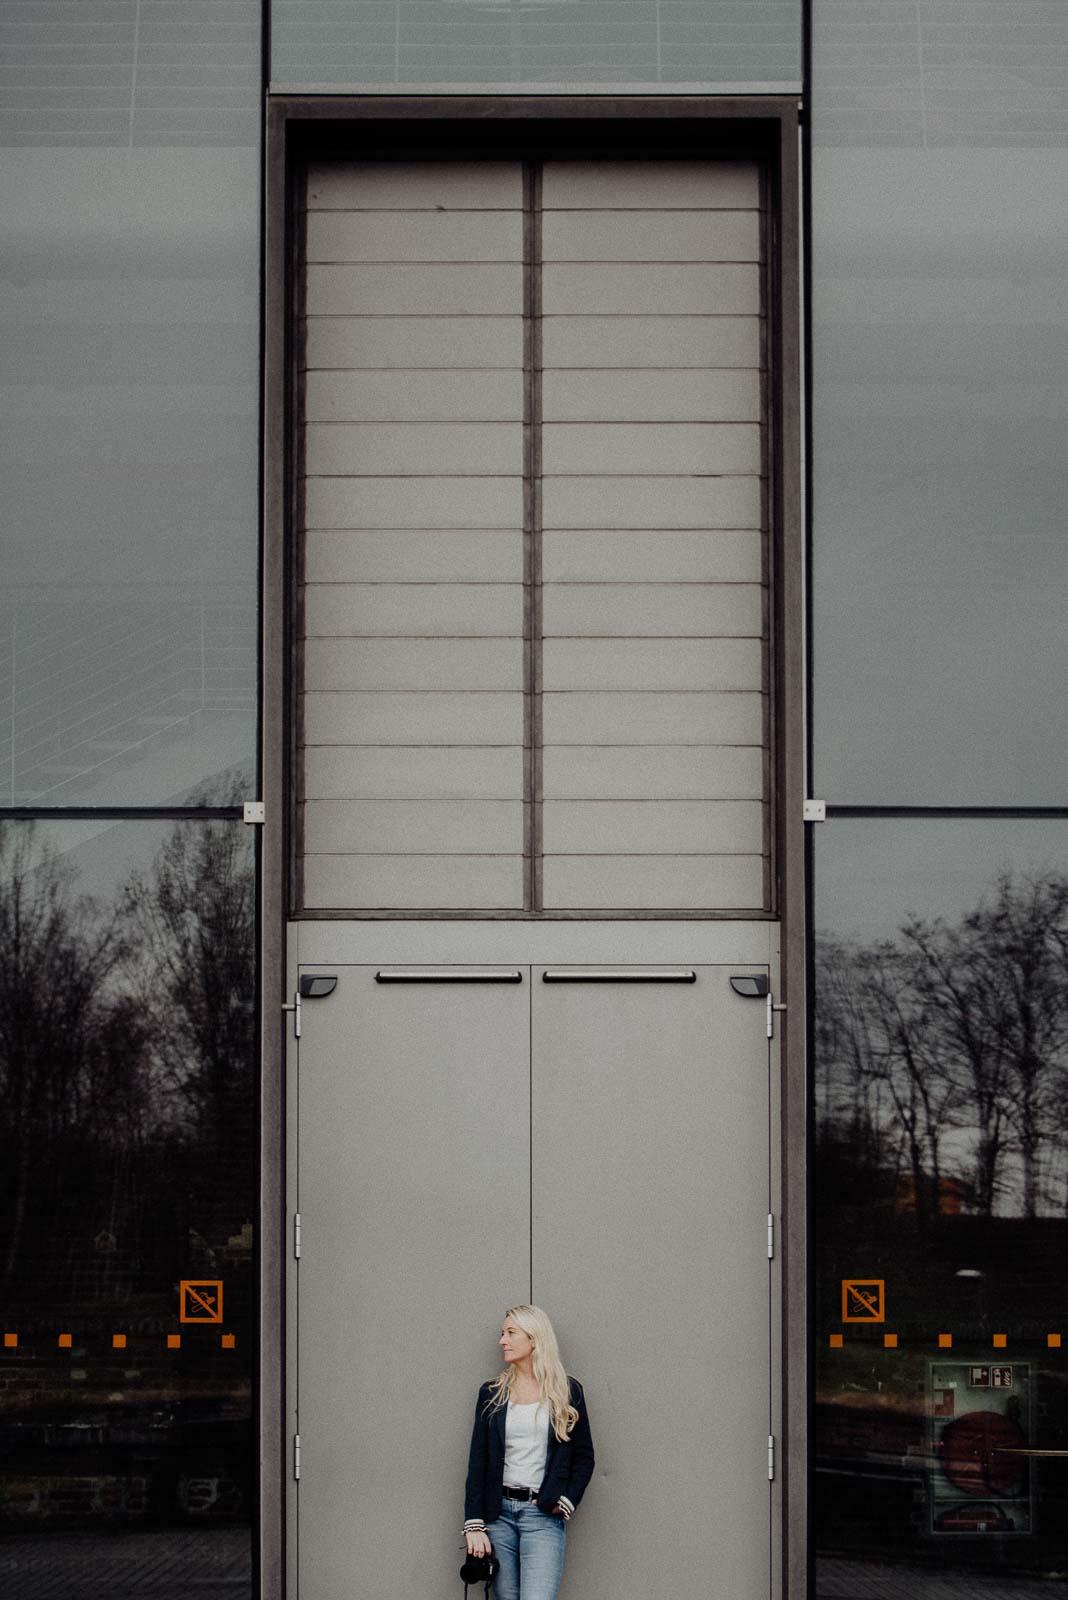 026-fotograf-witten-bochum-businessshooting-urban